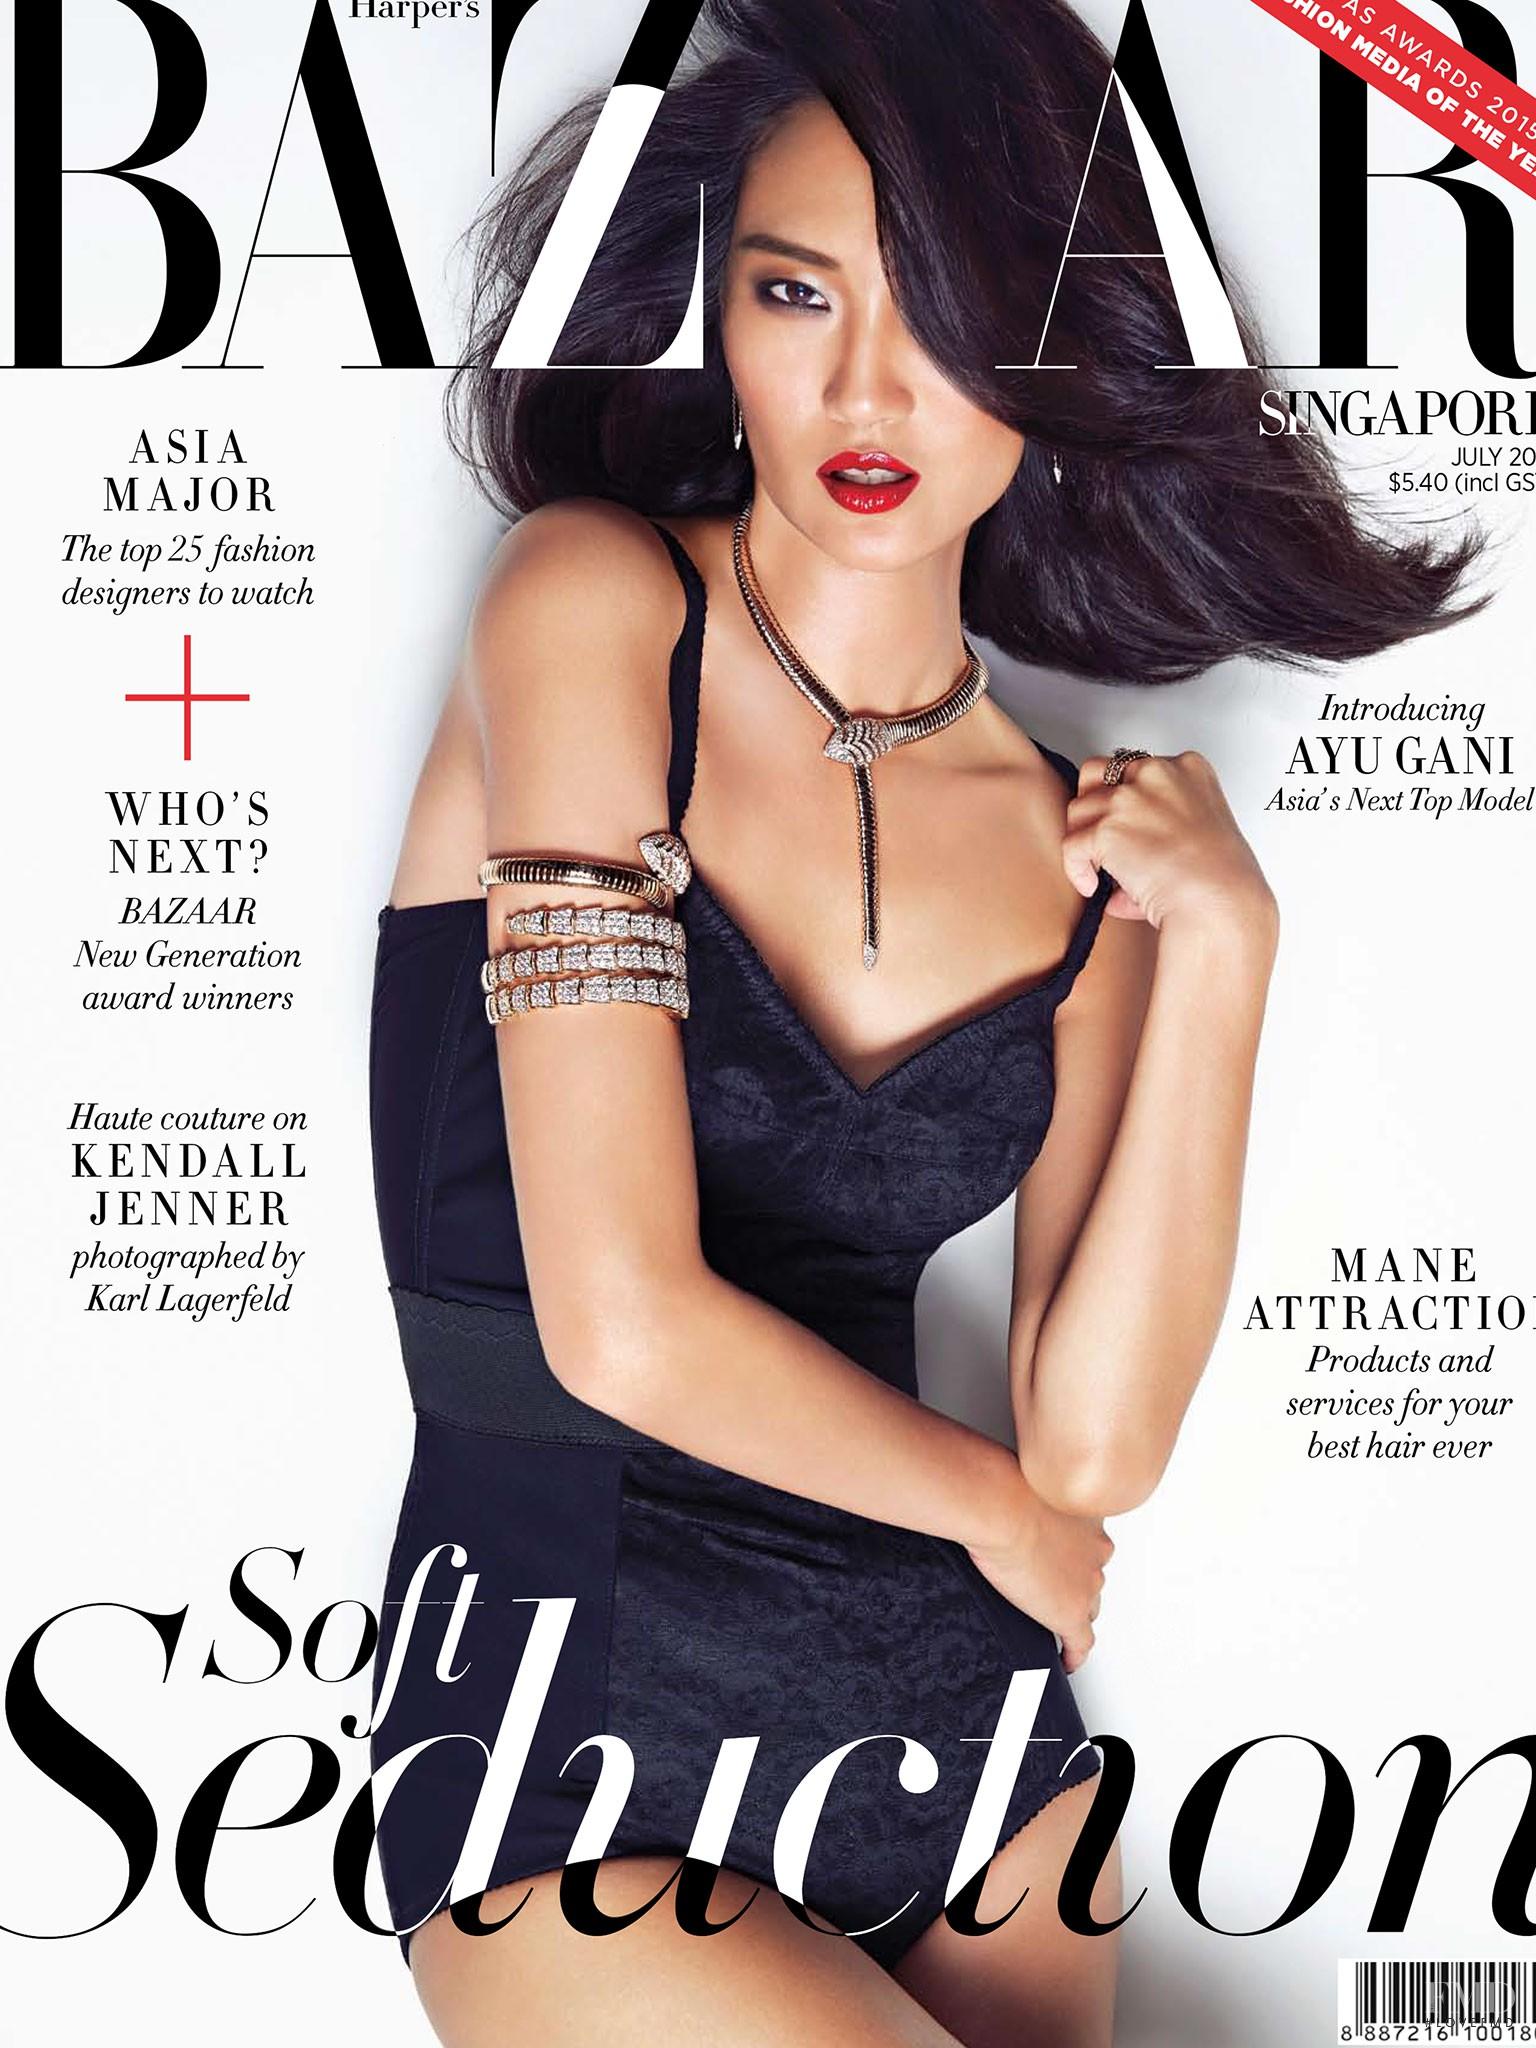 Fashion magazine in singapore 35